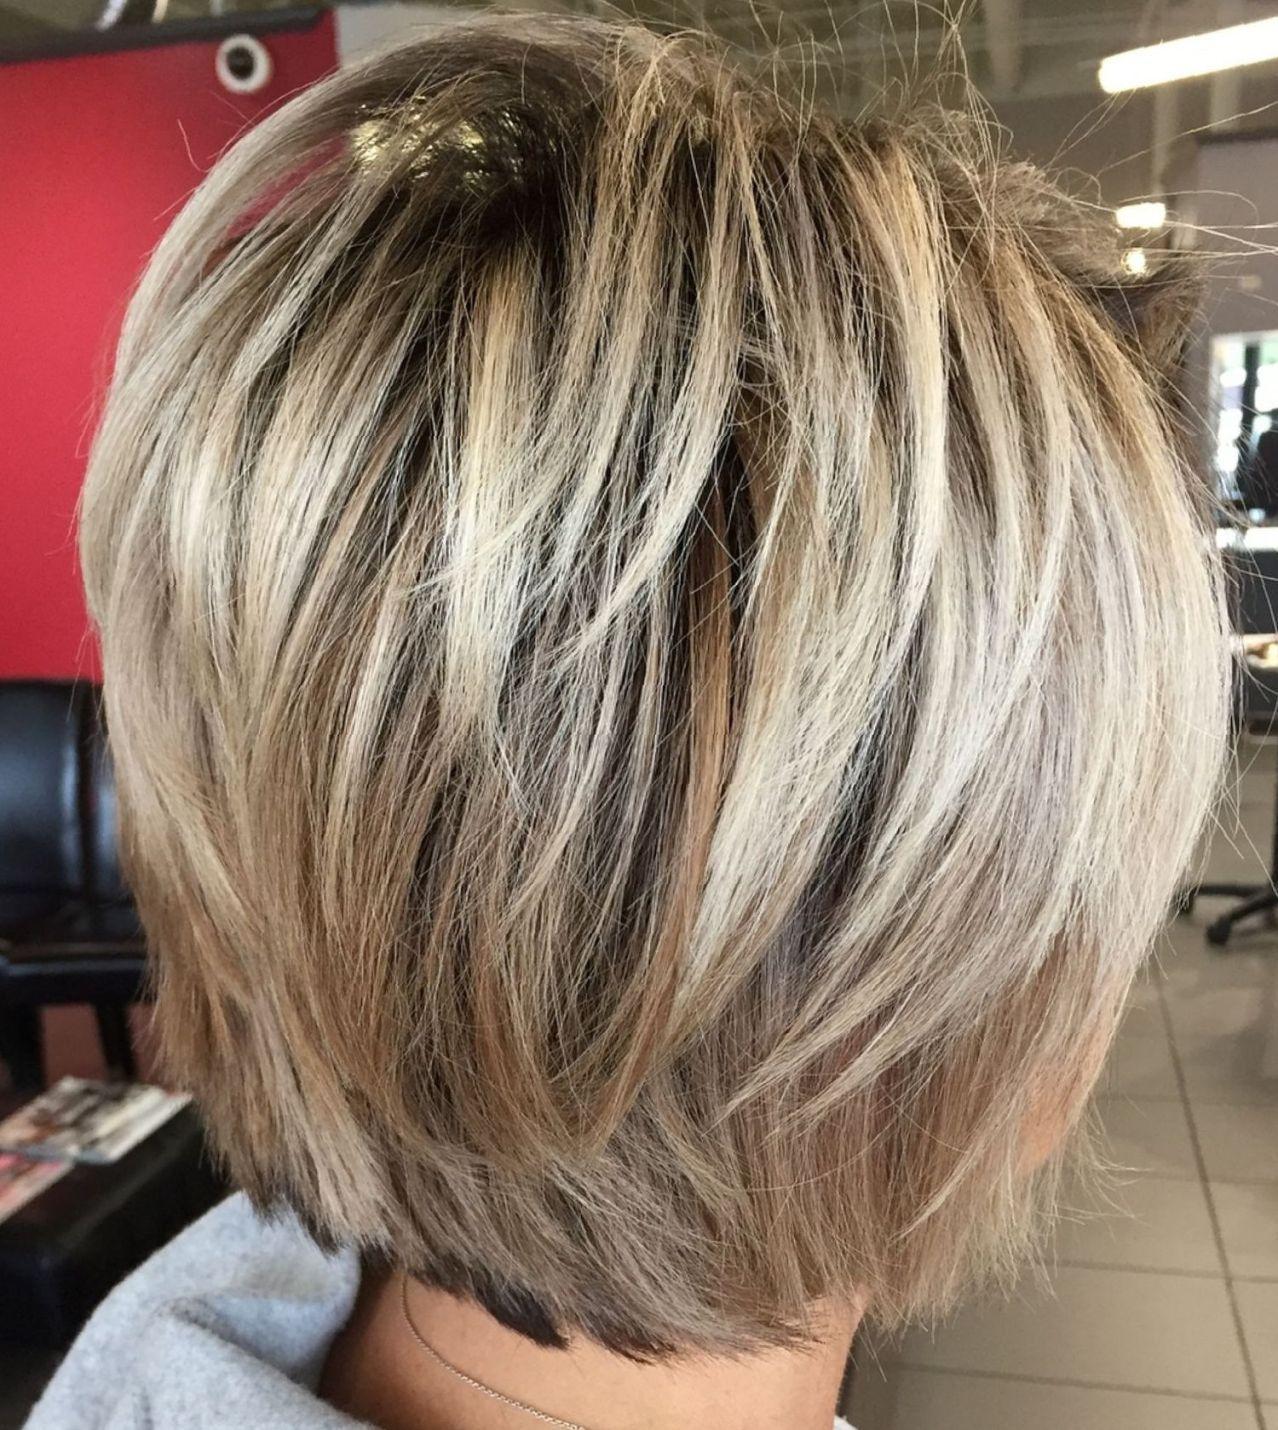 Layered Blonde Balayage Bob Kapsels Fijn Haar Kapsels Haar Highlights